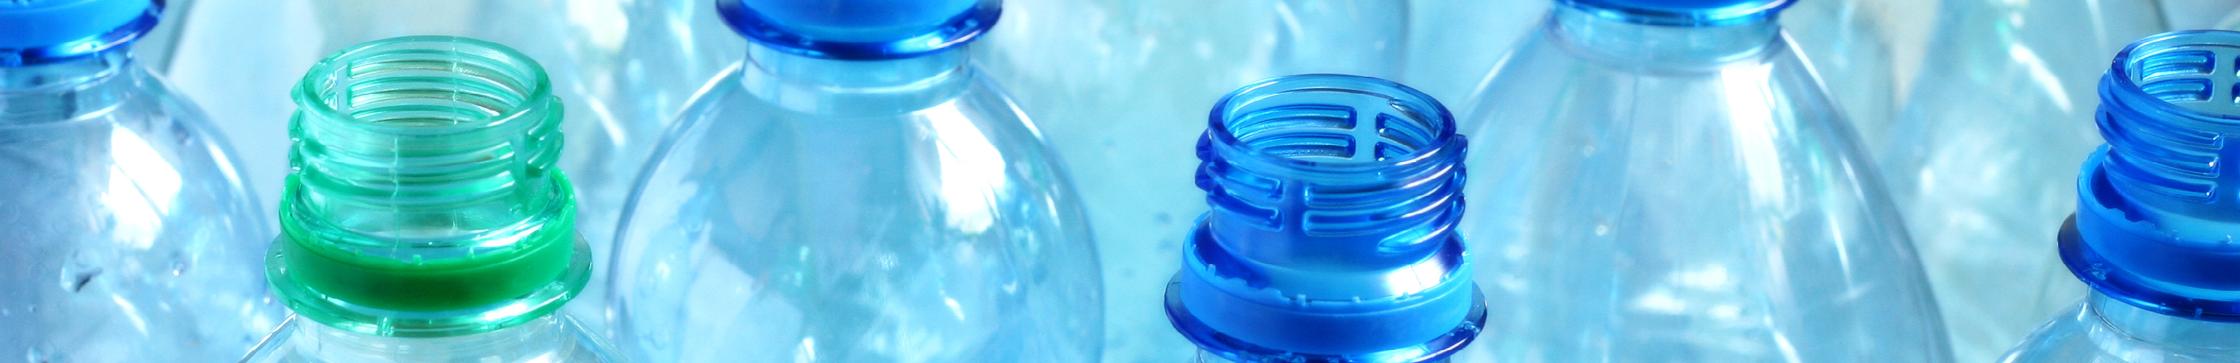 Molded Plastics Case Study